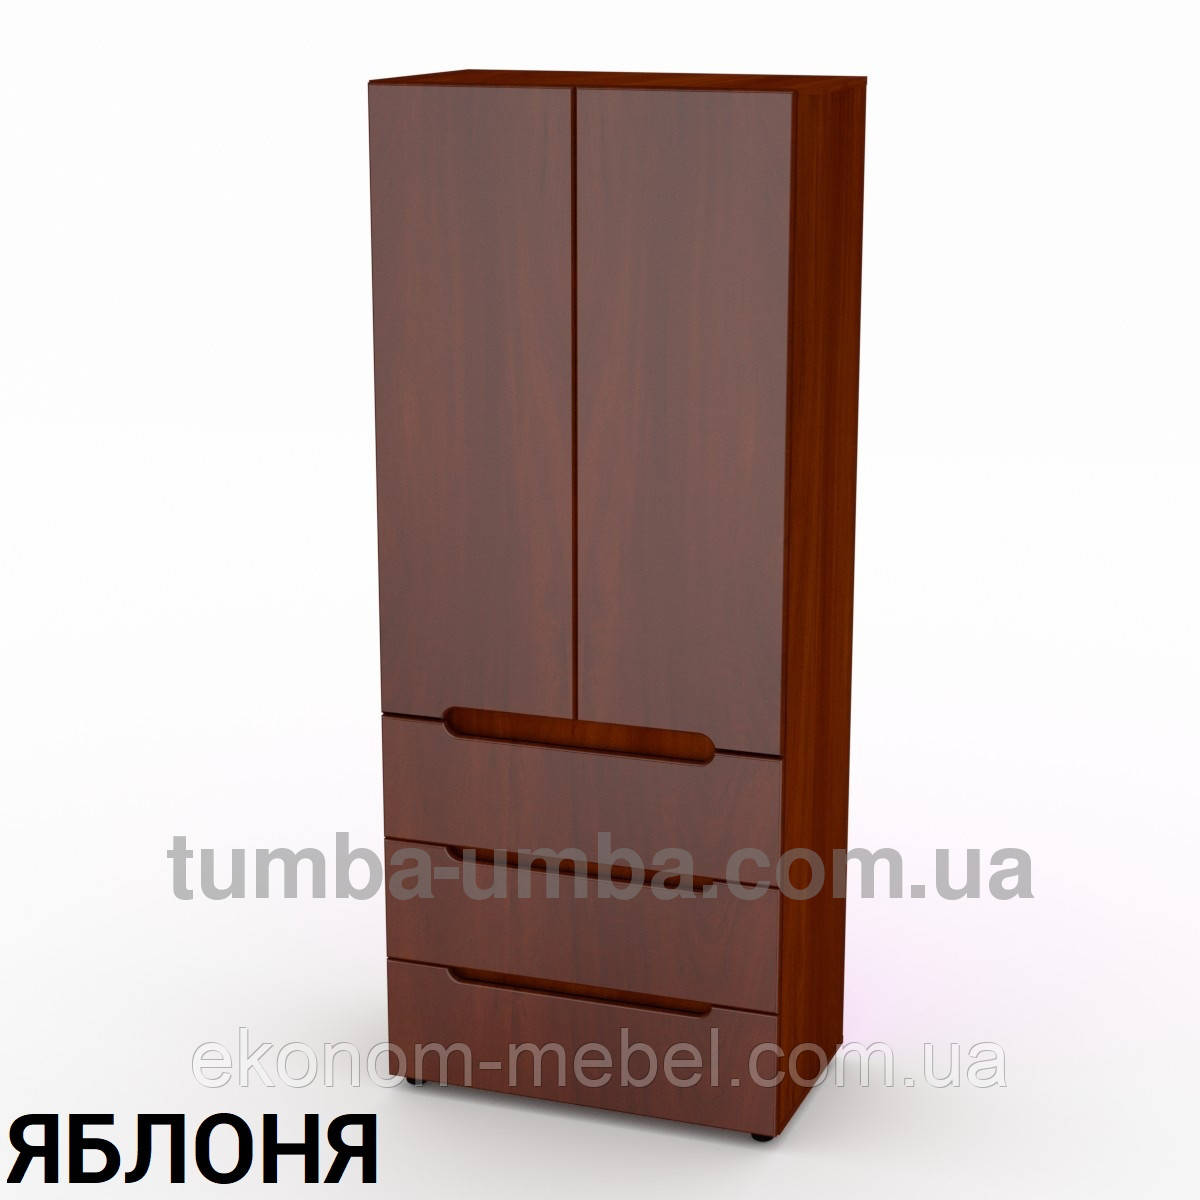 Шкаф-22 МДФ